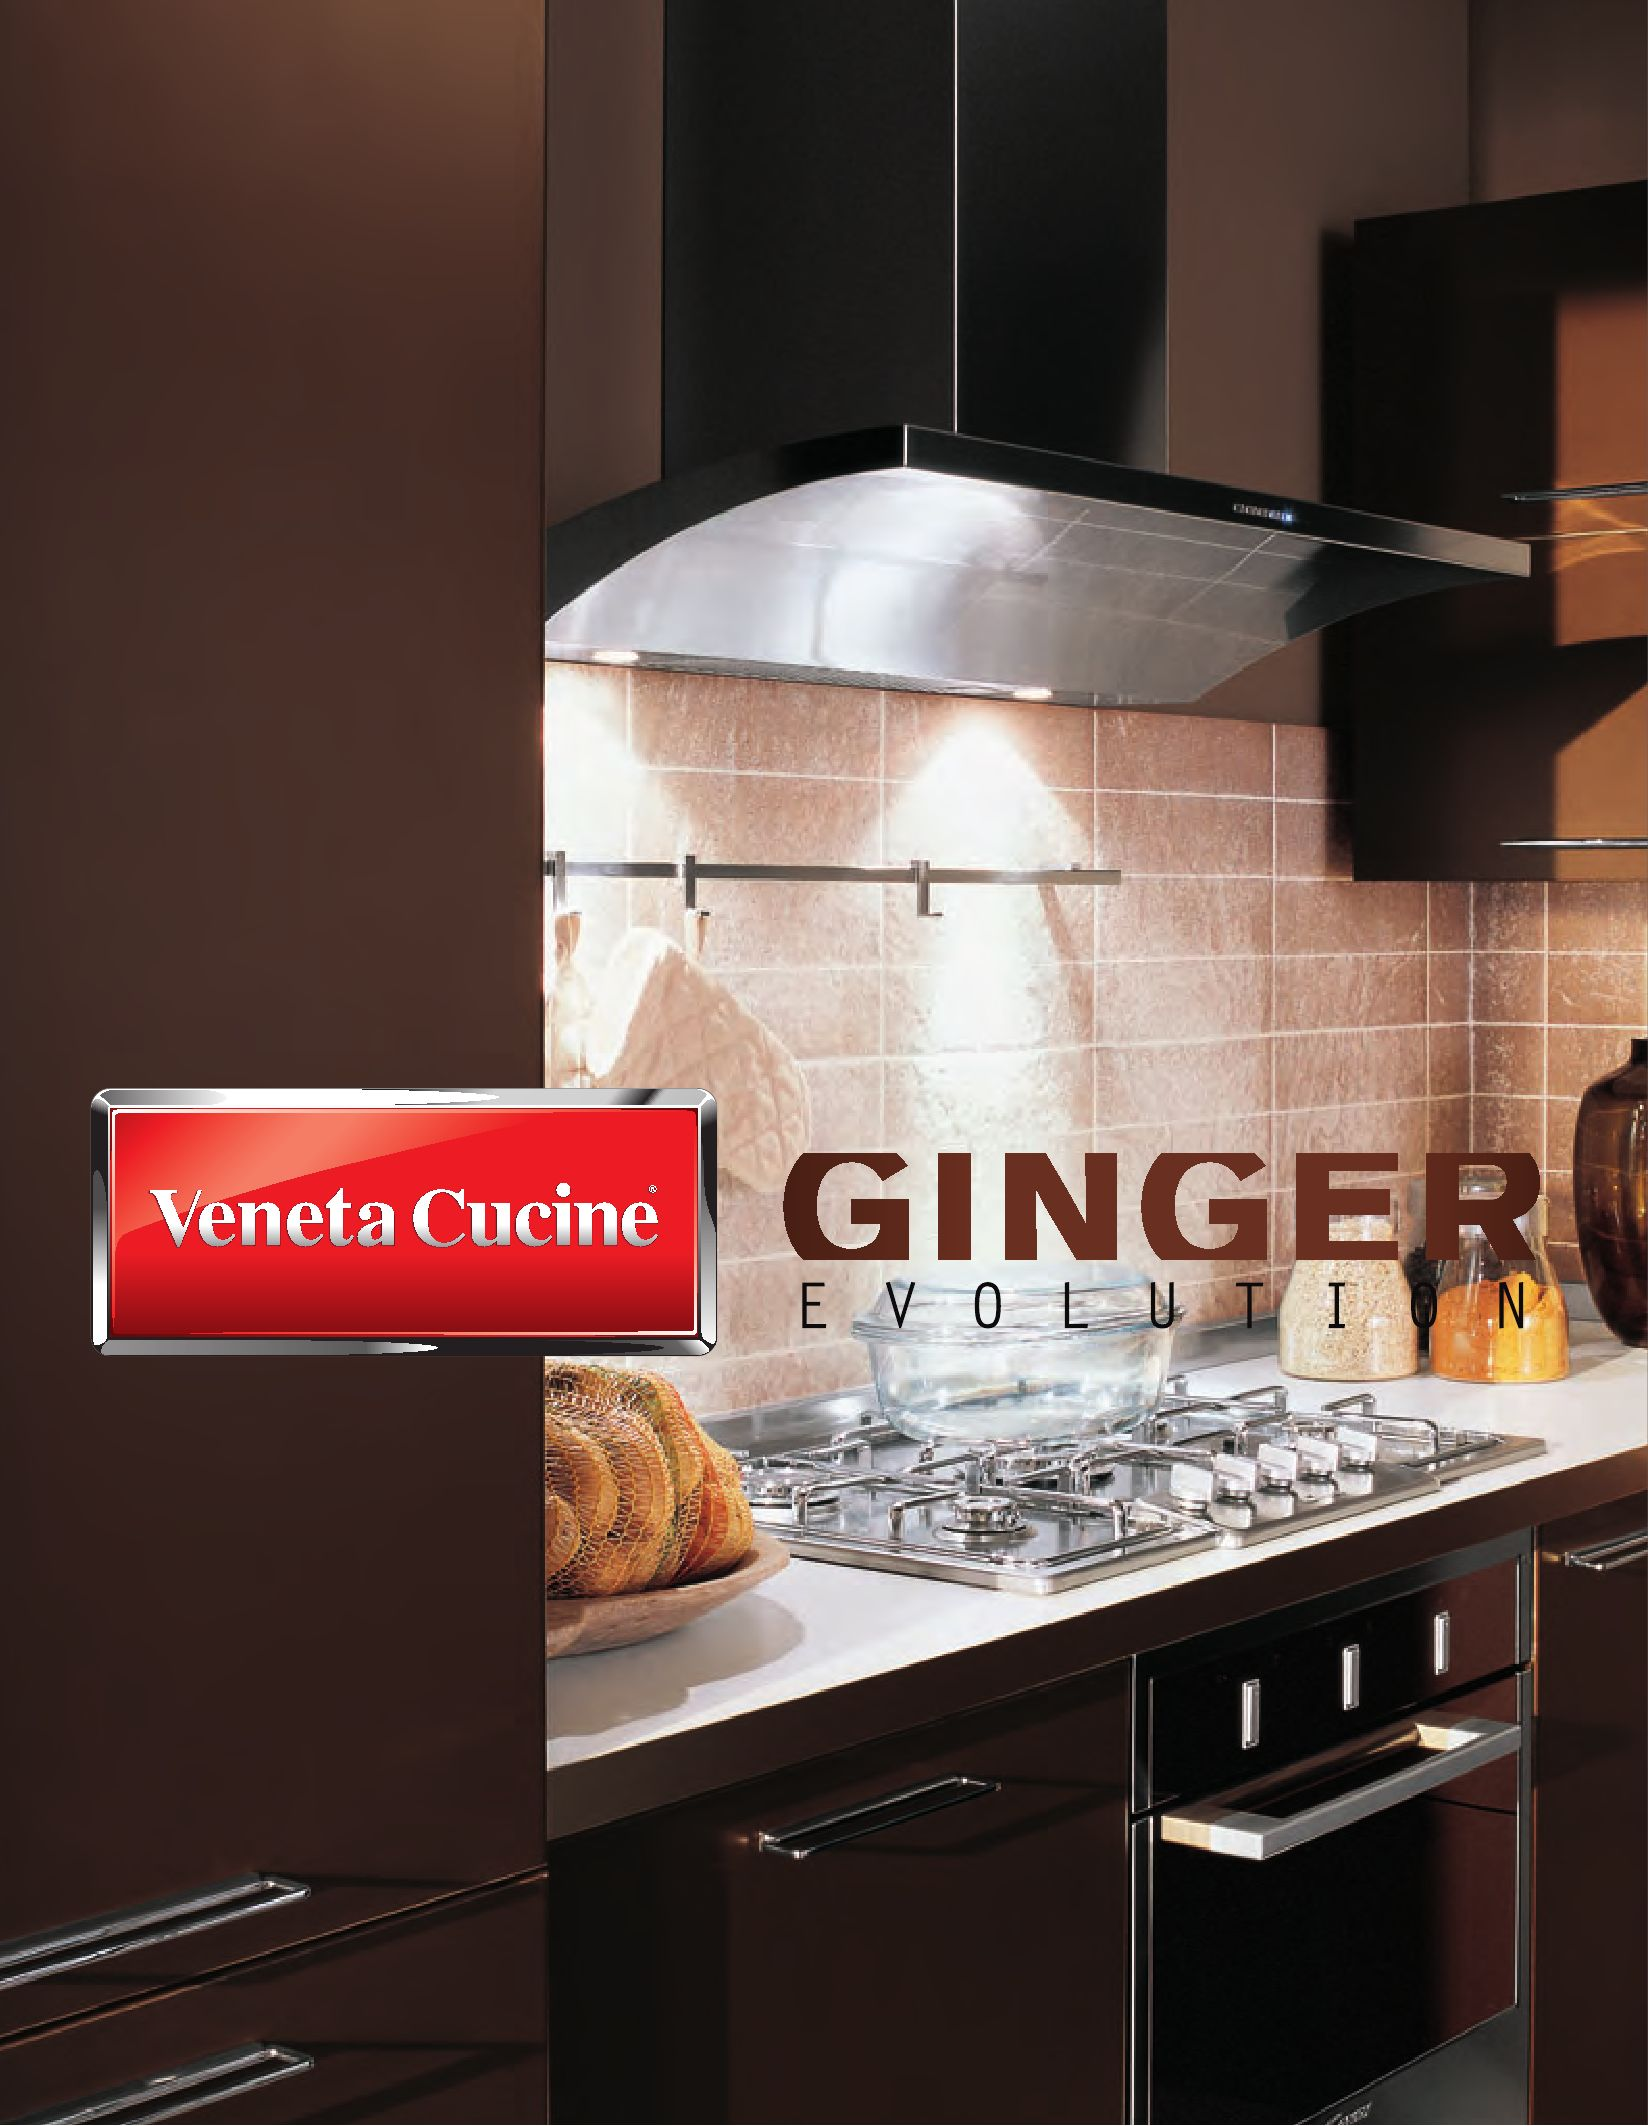 Ginger Veneta Cucine.Catalogo Veneta Cucine Ginger By 1216 Mobiliaris Issuu